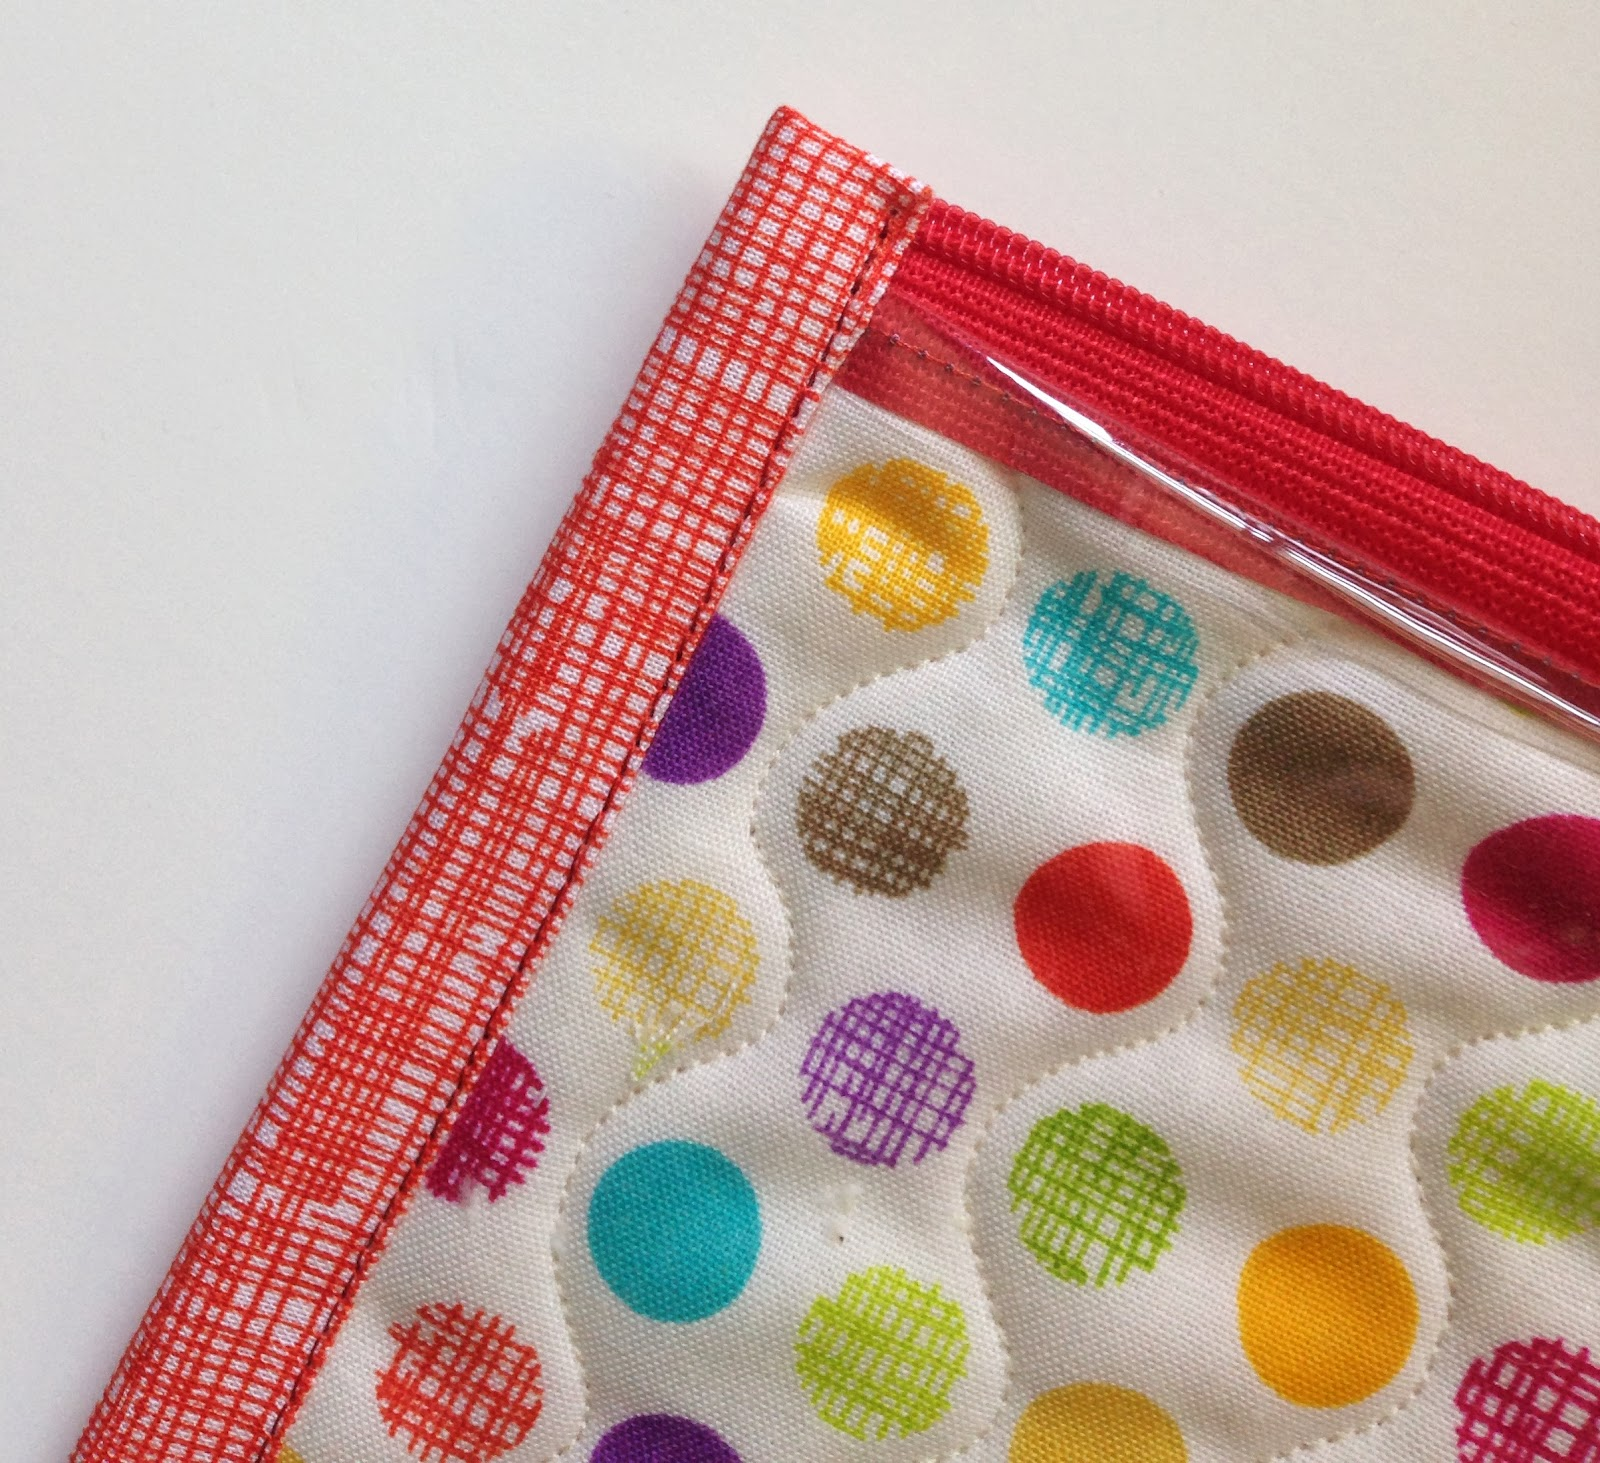 A Few Scraps Poly Pockets See Through Zipper Pouch Tutorial